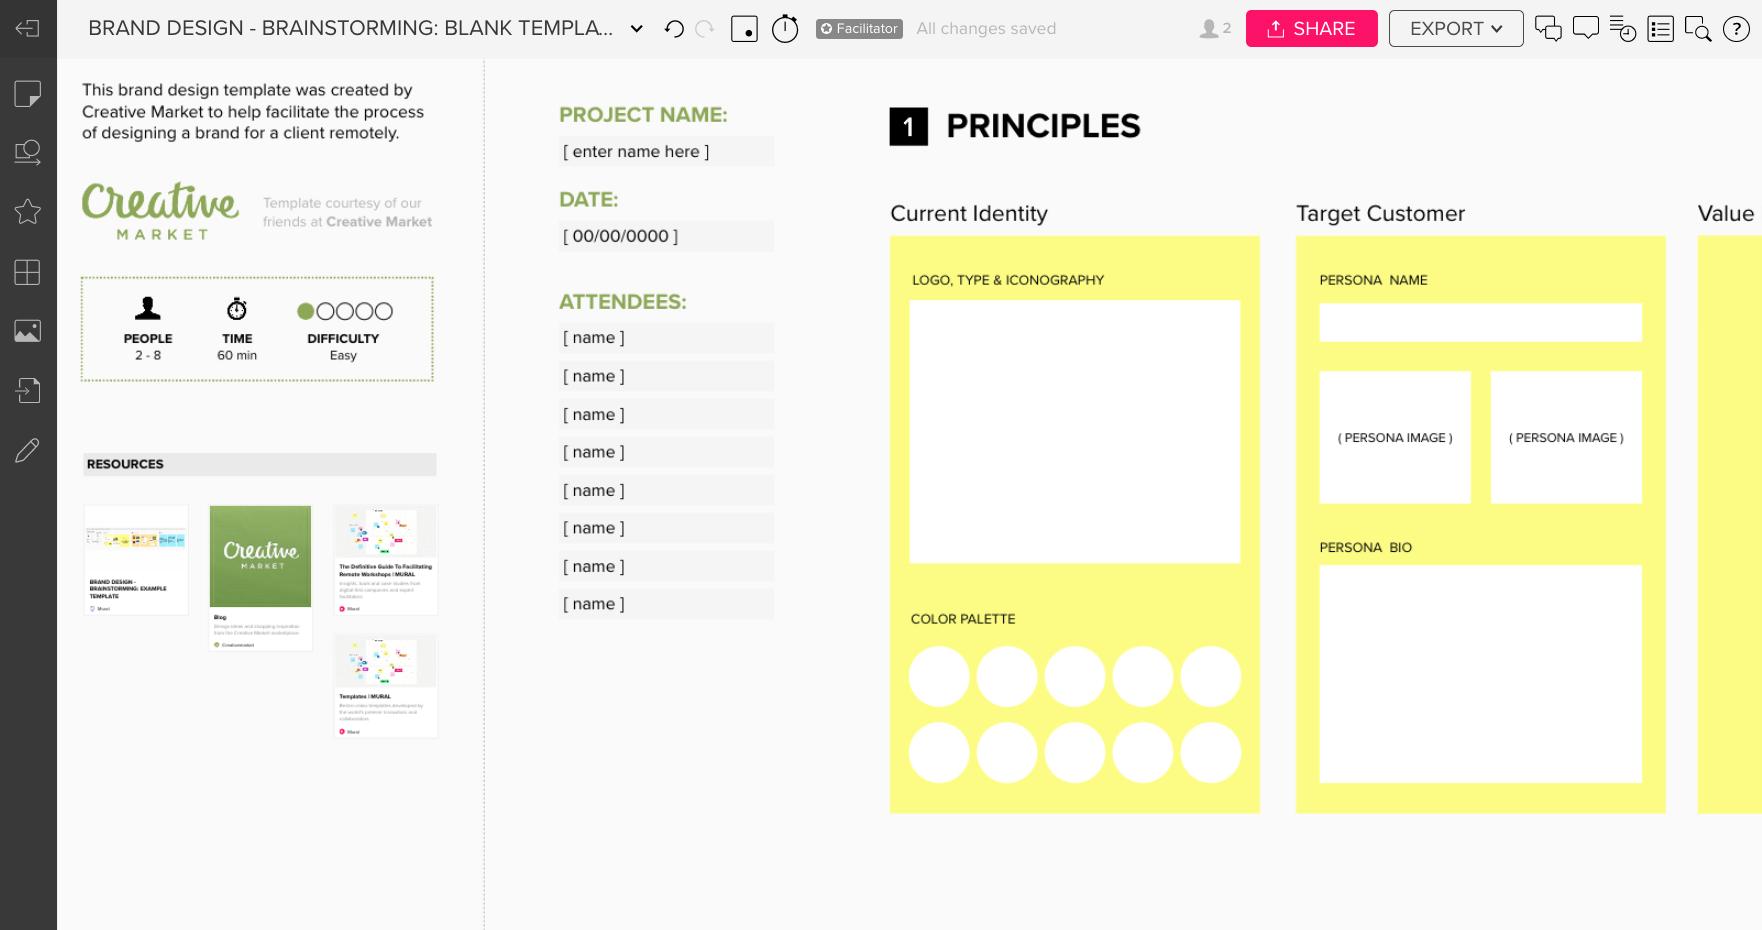 Brand Design Brainstorm